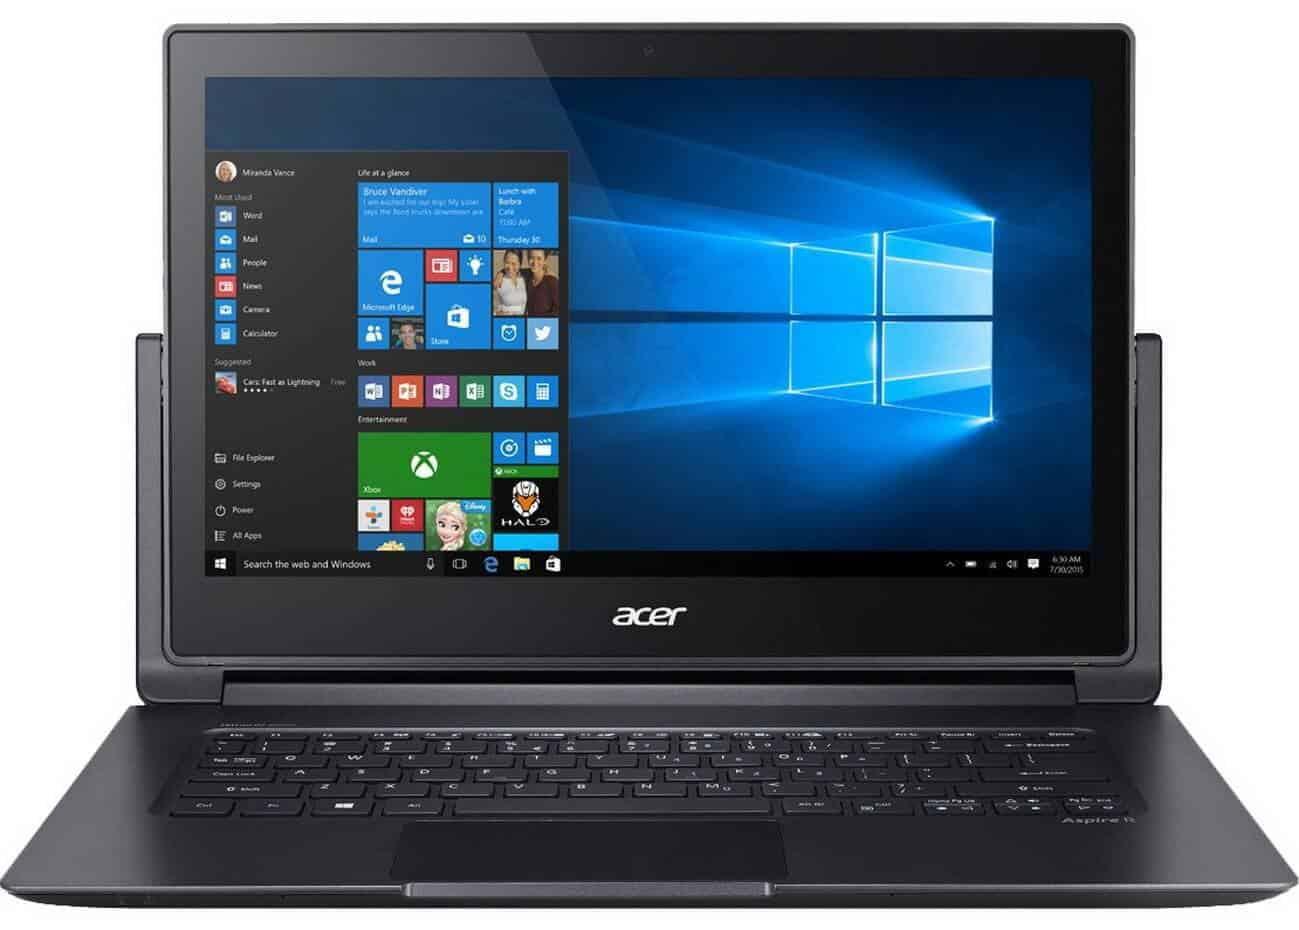 Acer Aspire R7-372T-743X - laptop 2 in 1 cu un display incredibil si performanta buna!